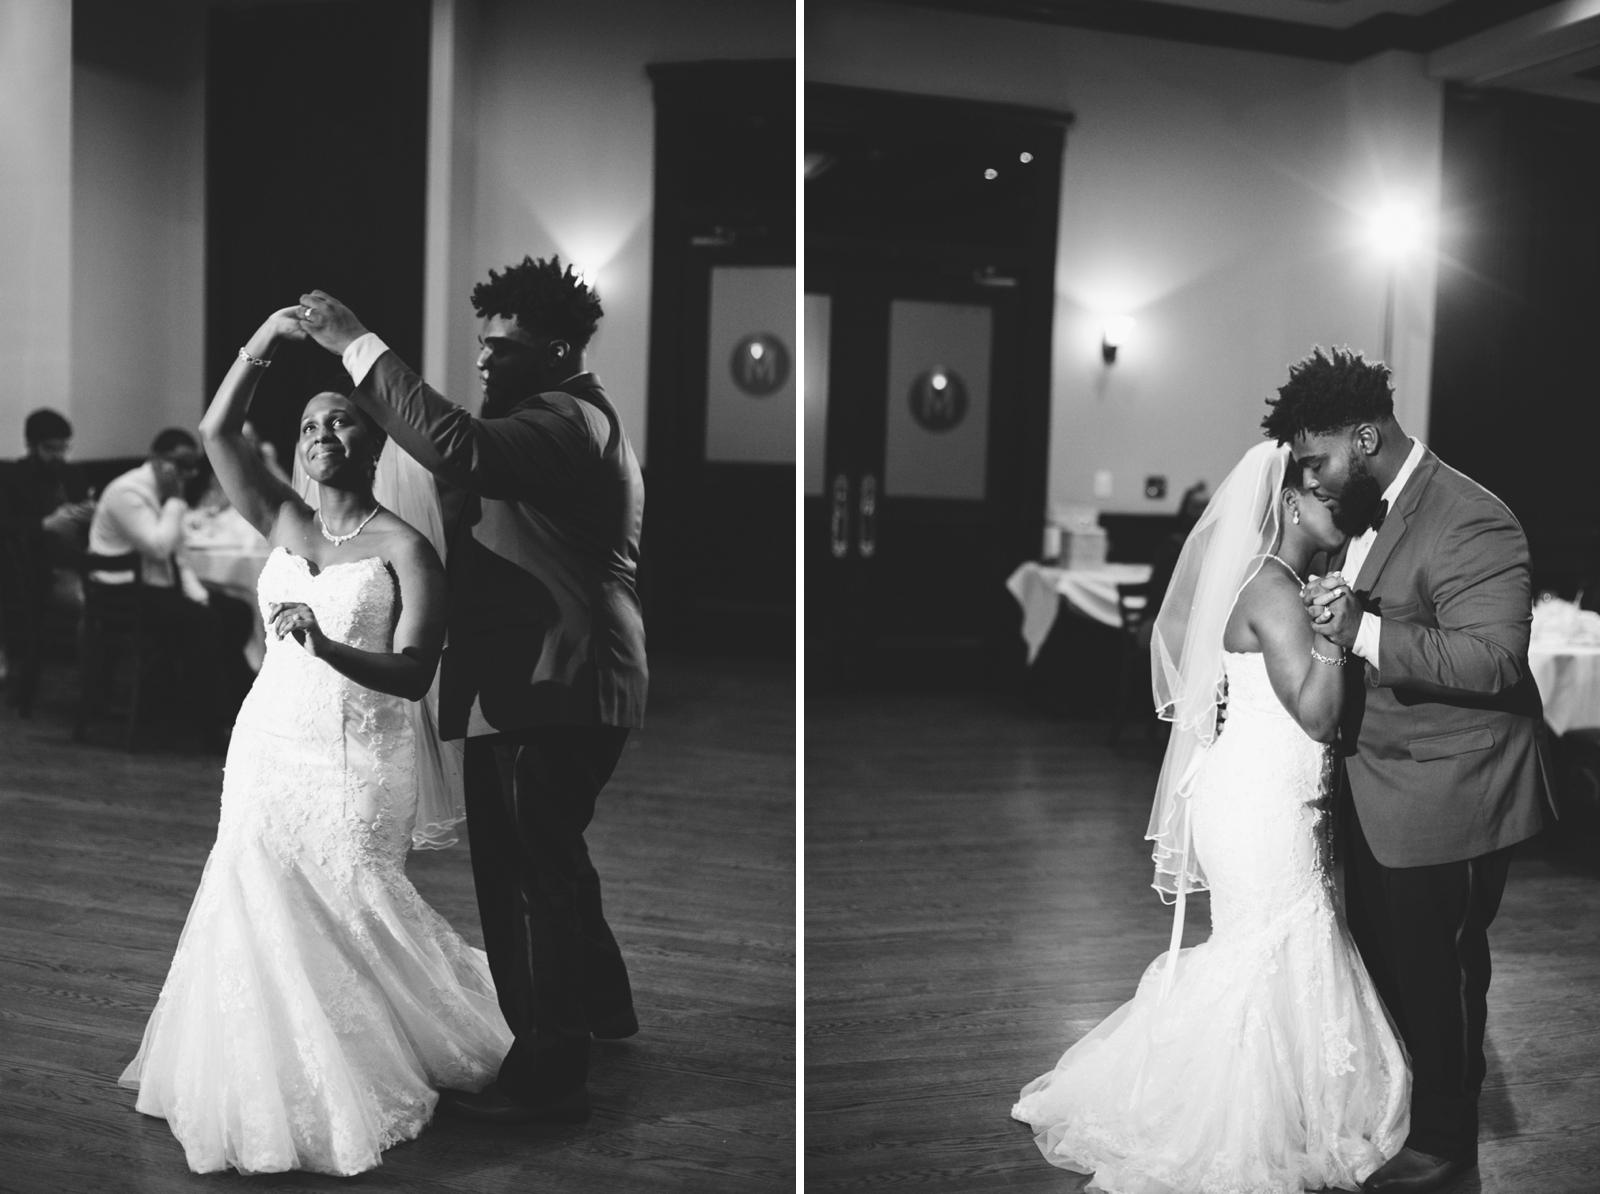 Bailey-Q-Photo-New-York-Wedding-029.jpg